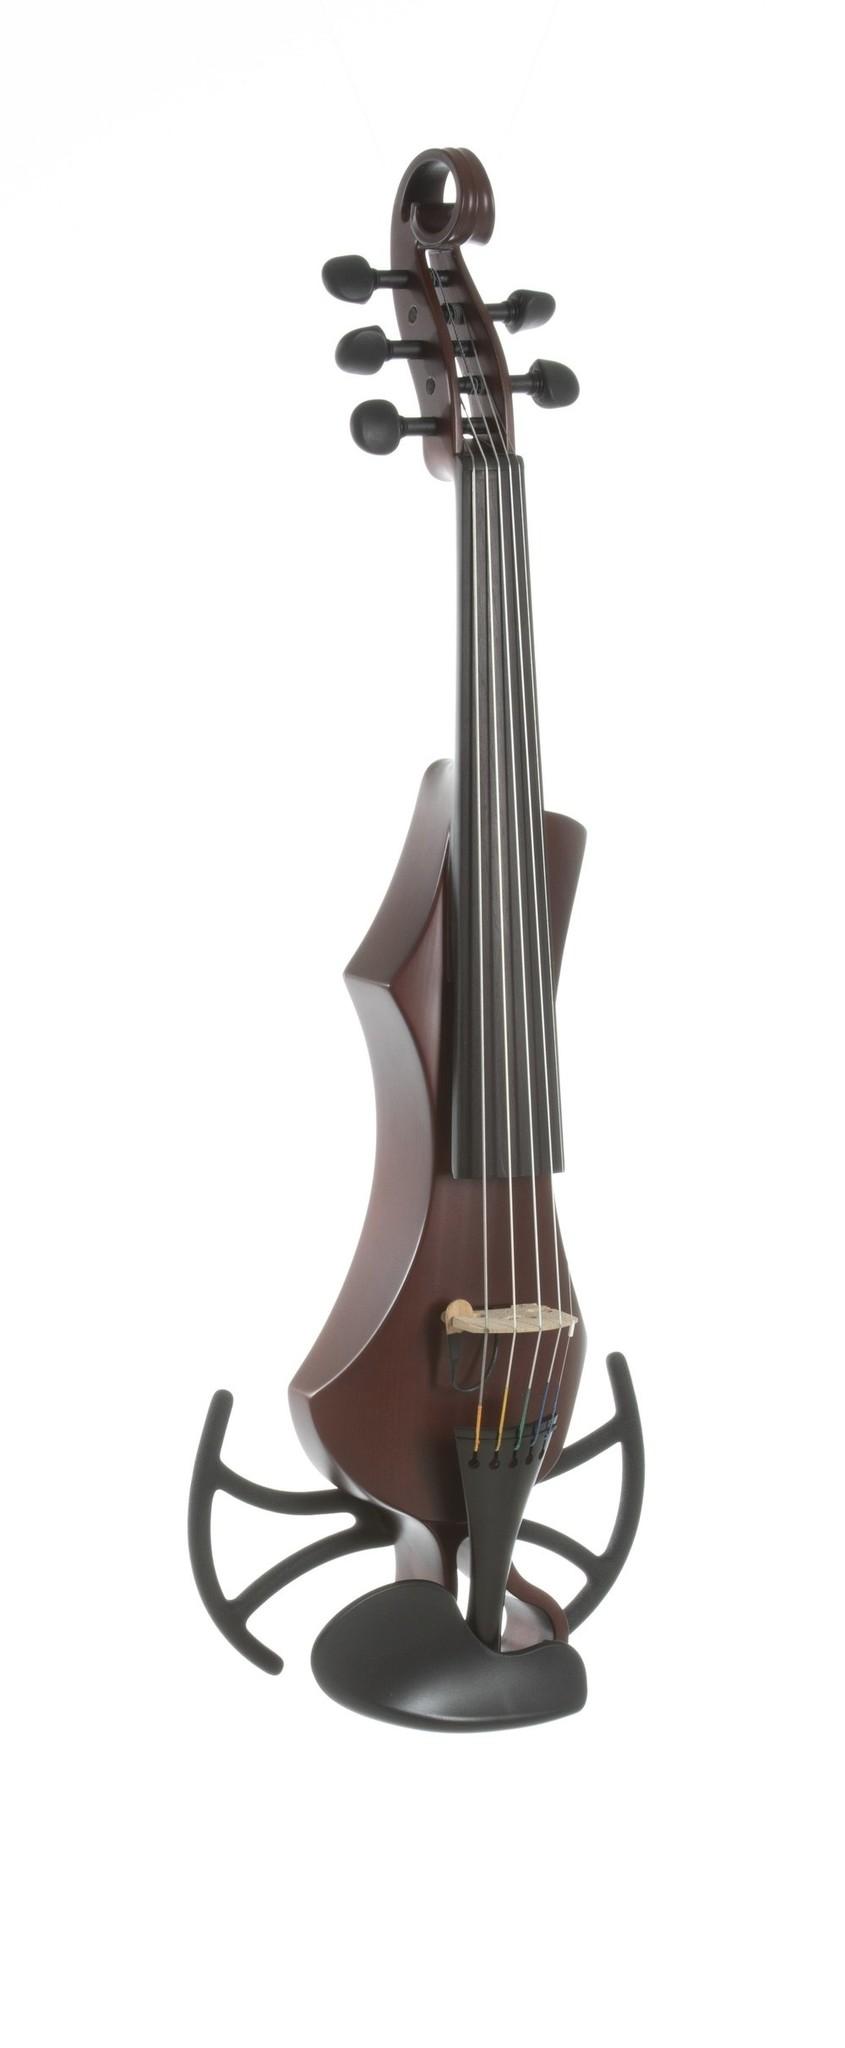 GEWA GEWA Novita 3.0 Electric 5-string violin, w/ adapter